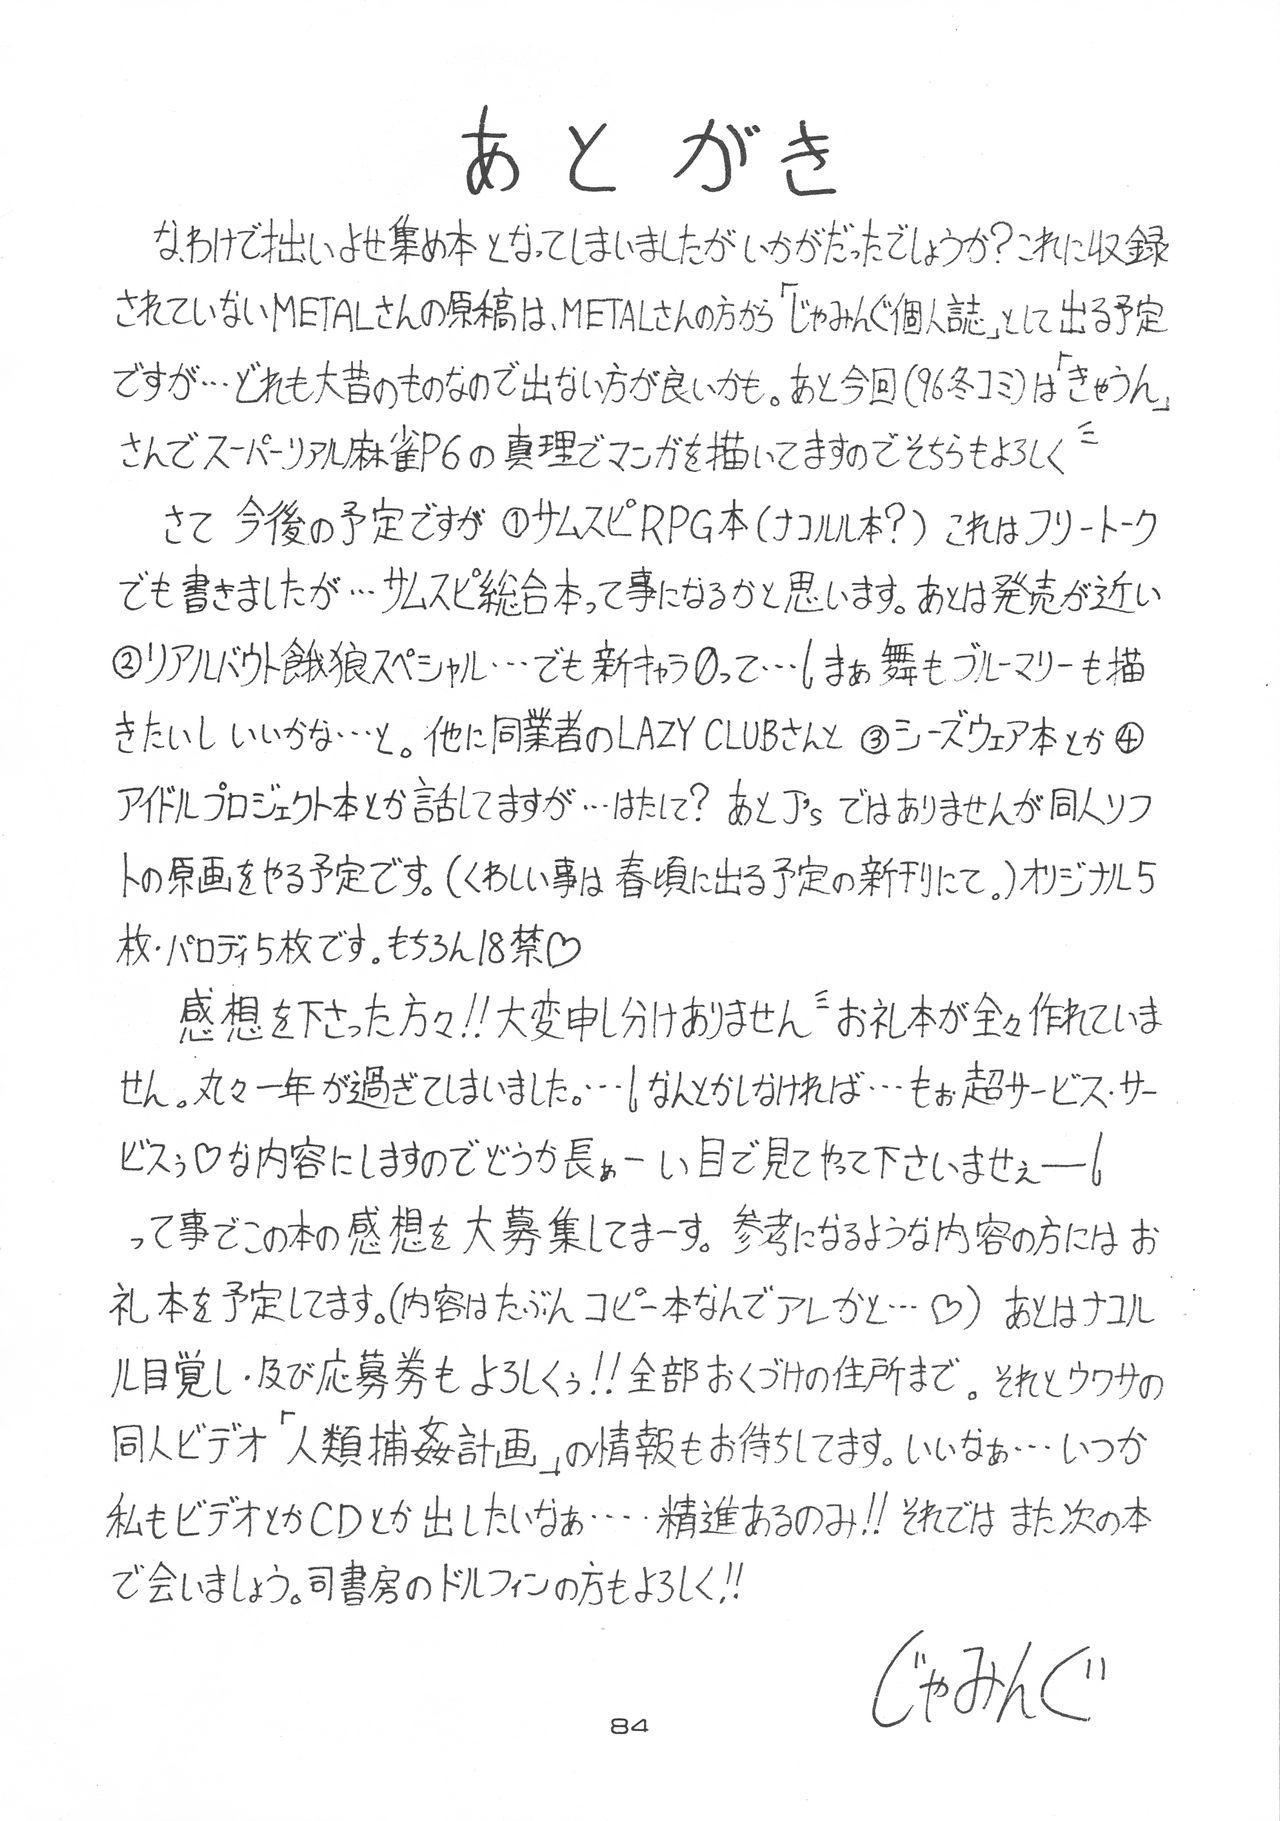 (C51) [J's Style (Jamming)] D2 (DOUBT TO DOUBT) Jamming Kojinshi 4 -Ditsuu- (Various) 83